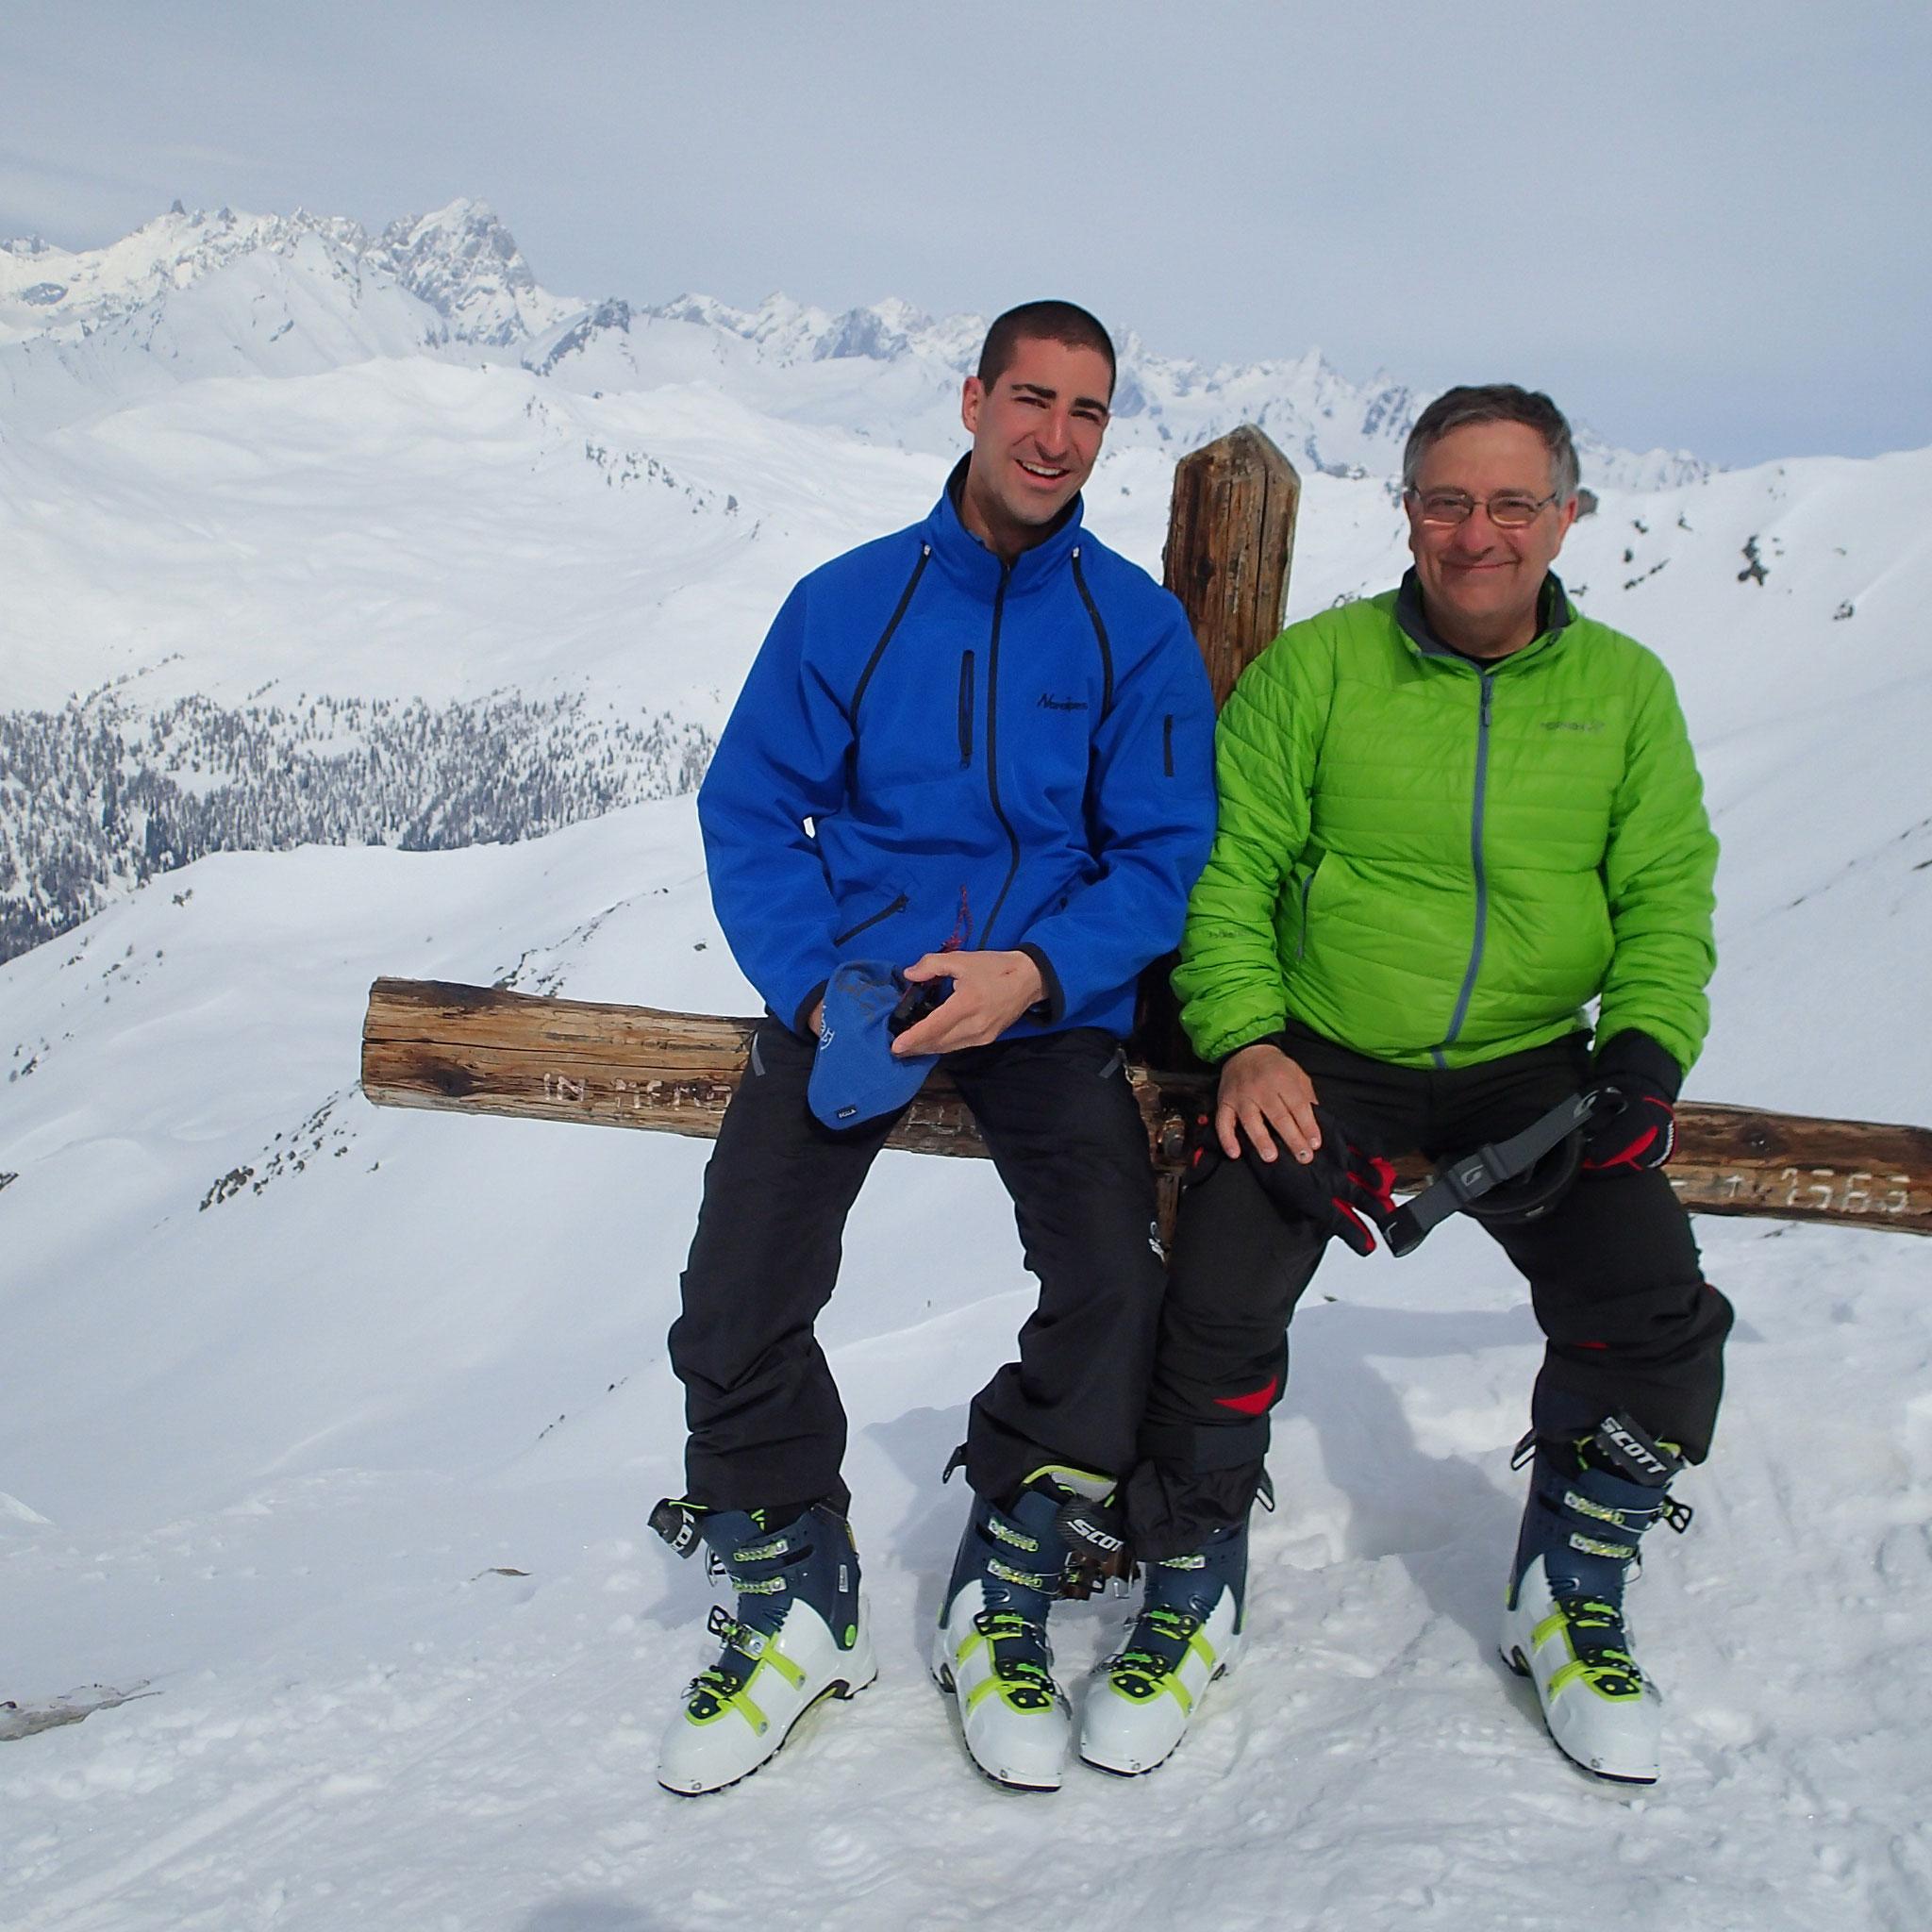 Marc et Michel au sommet. Bravo !